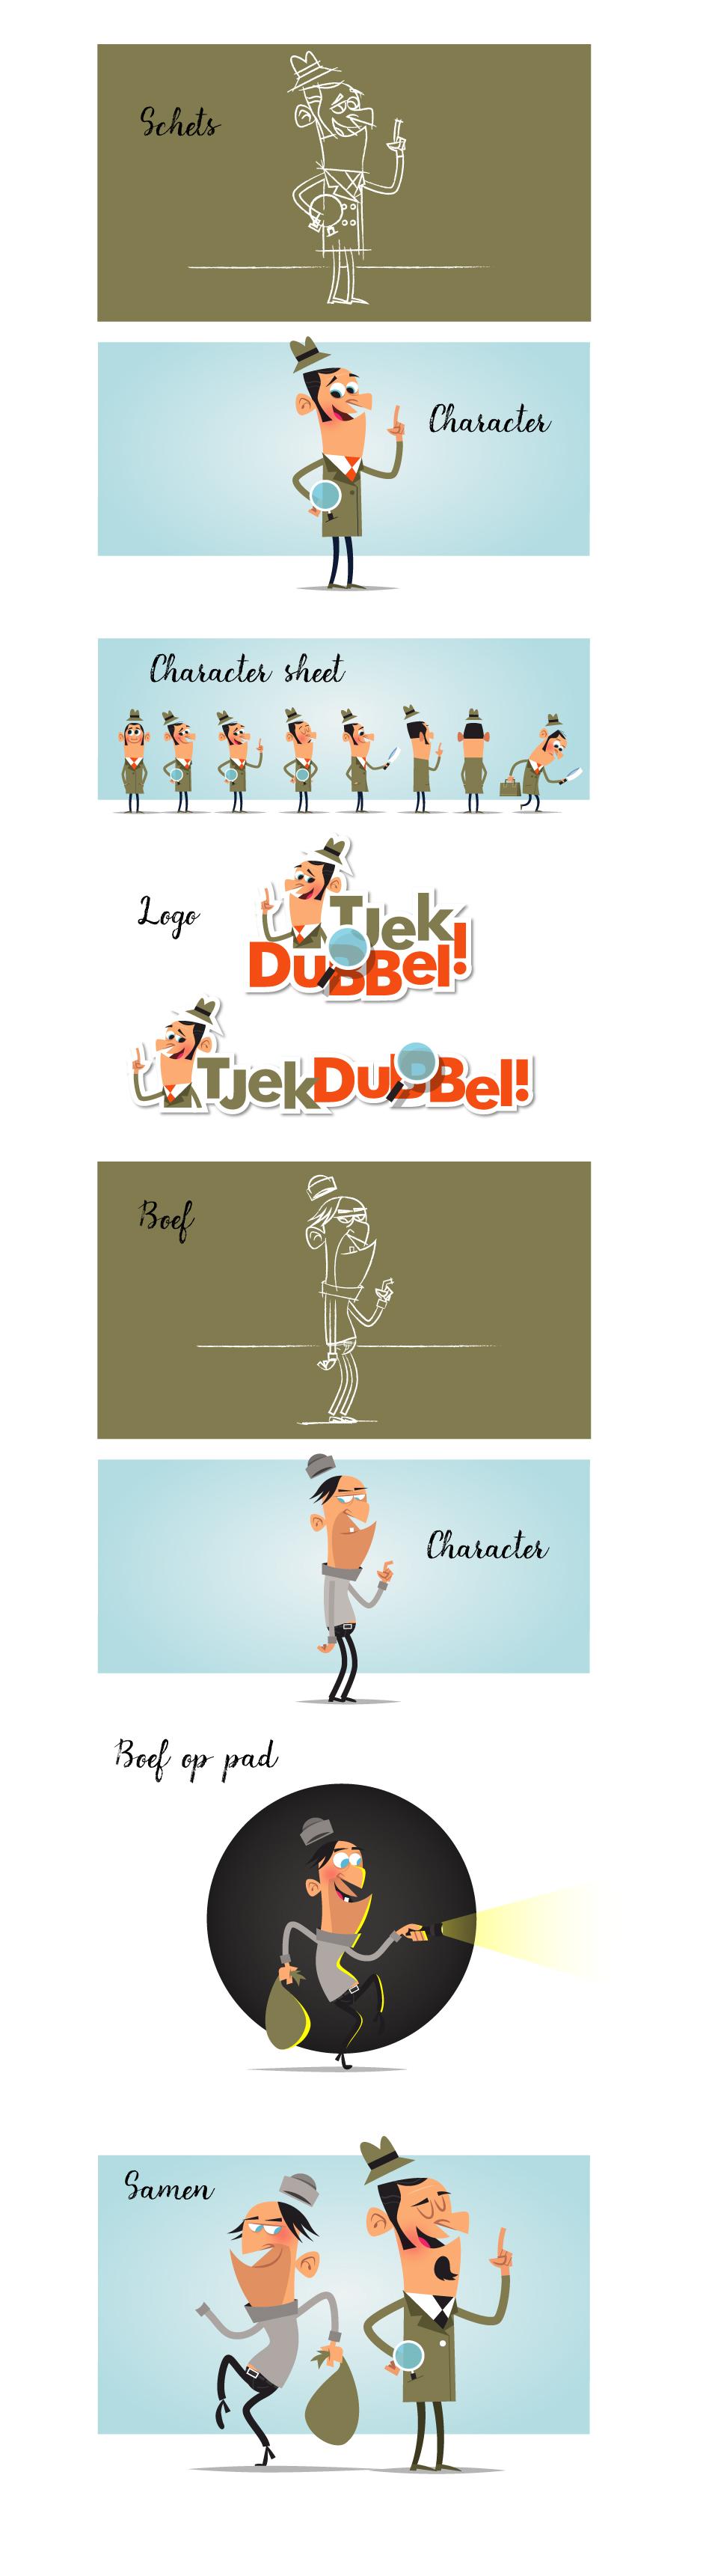 Tjek dubbel characterdesign reclamebureau Rotterdam freelance illustrator infographic laten maken Rotterdam animatie laten maken